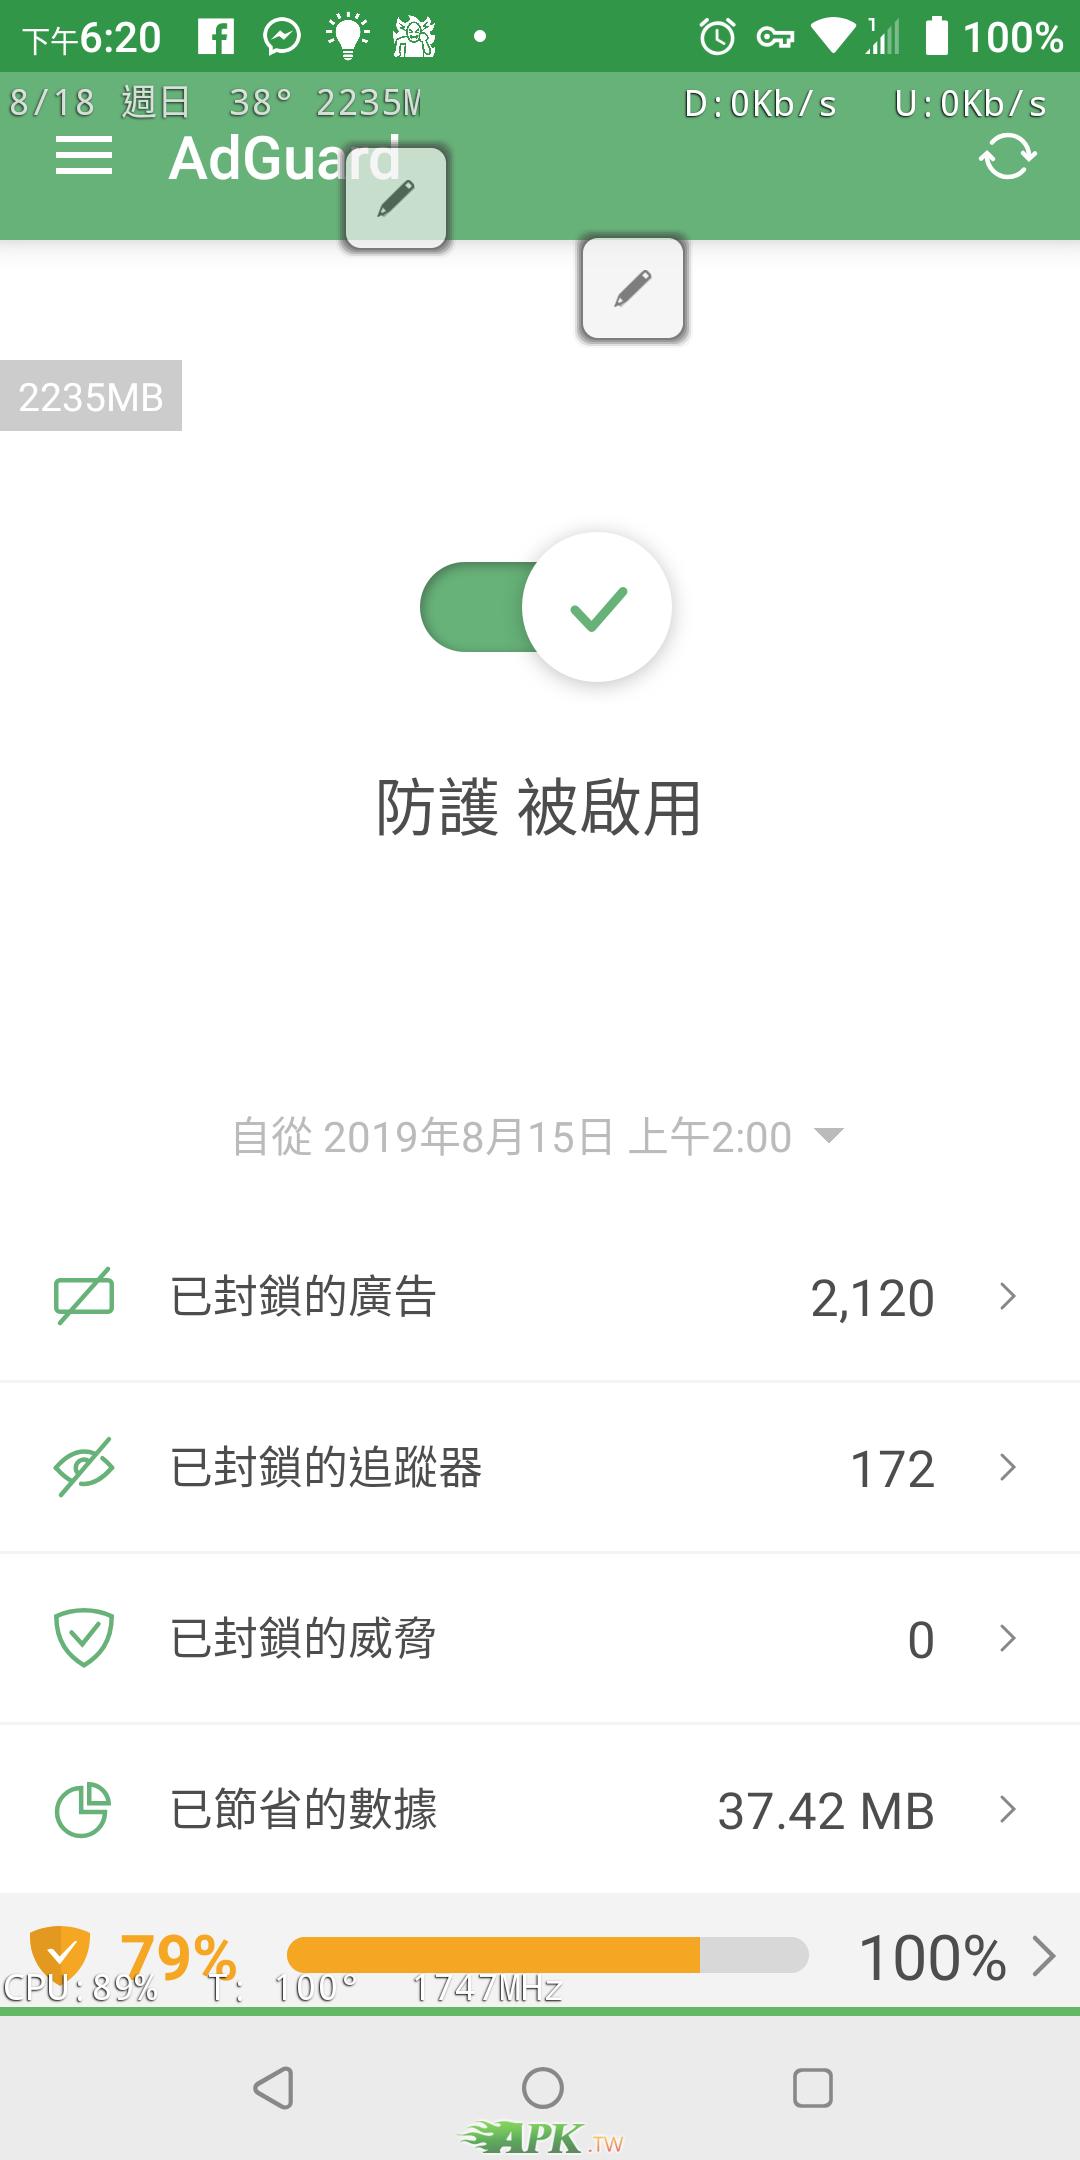 Screenshot_20190818-182027.png